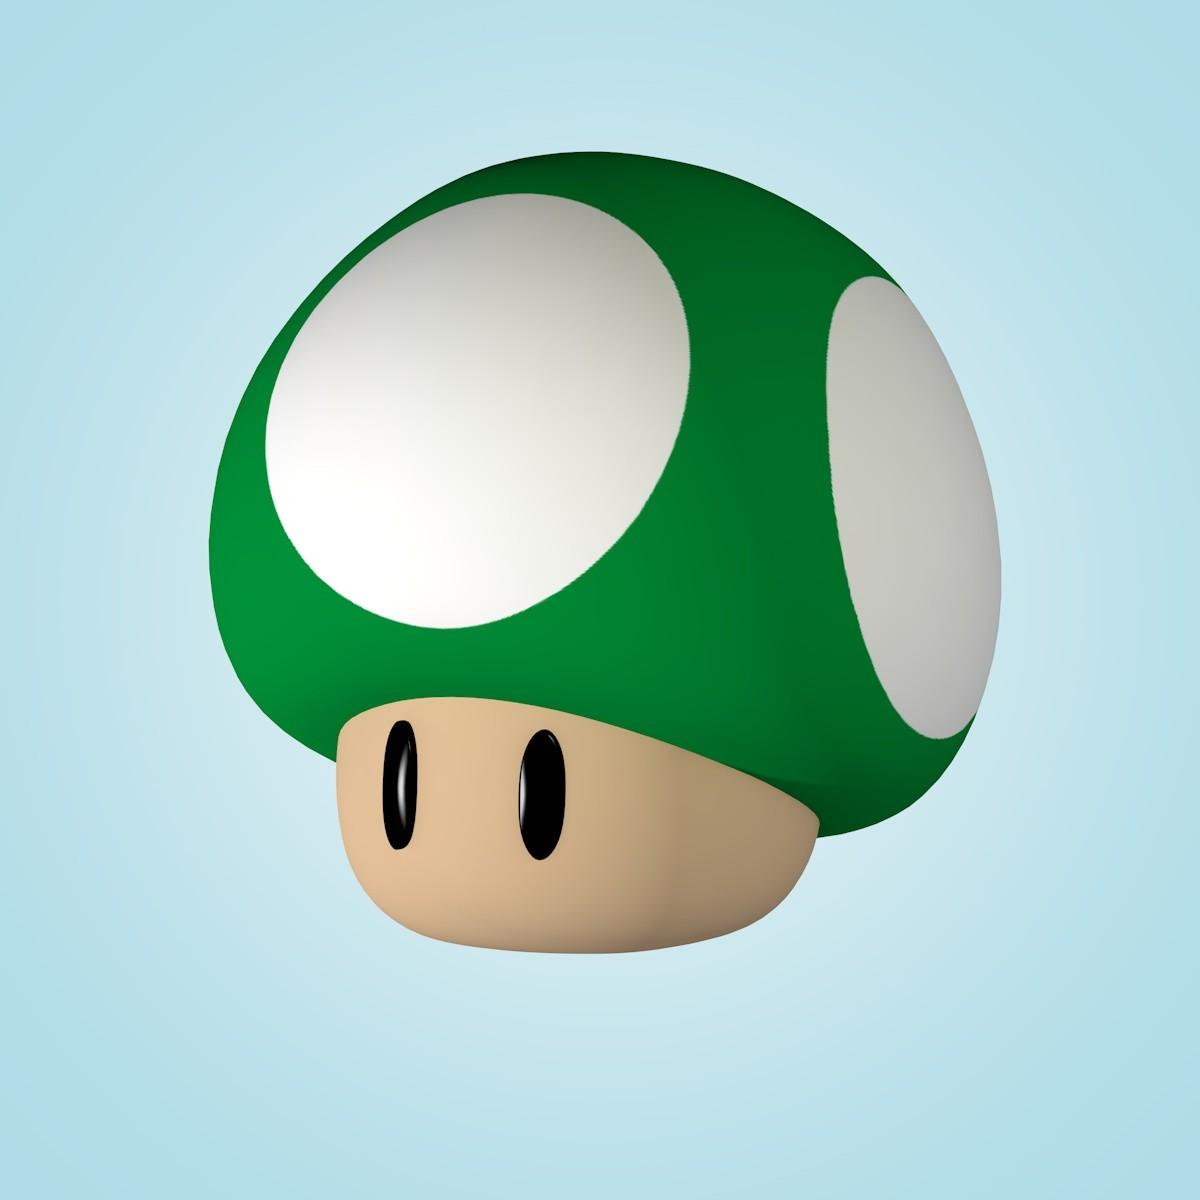 1200x1200 Mushroom clipart mario character